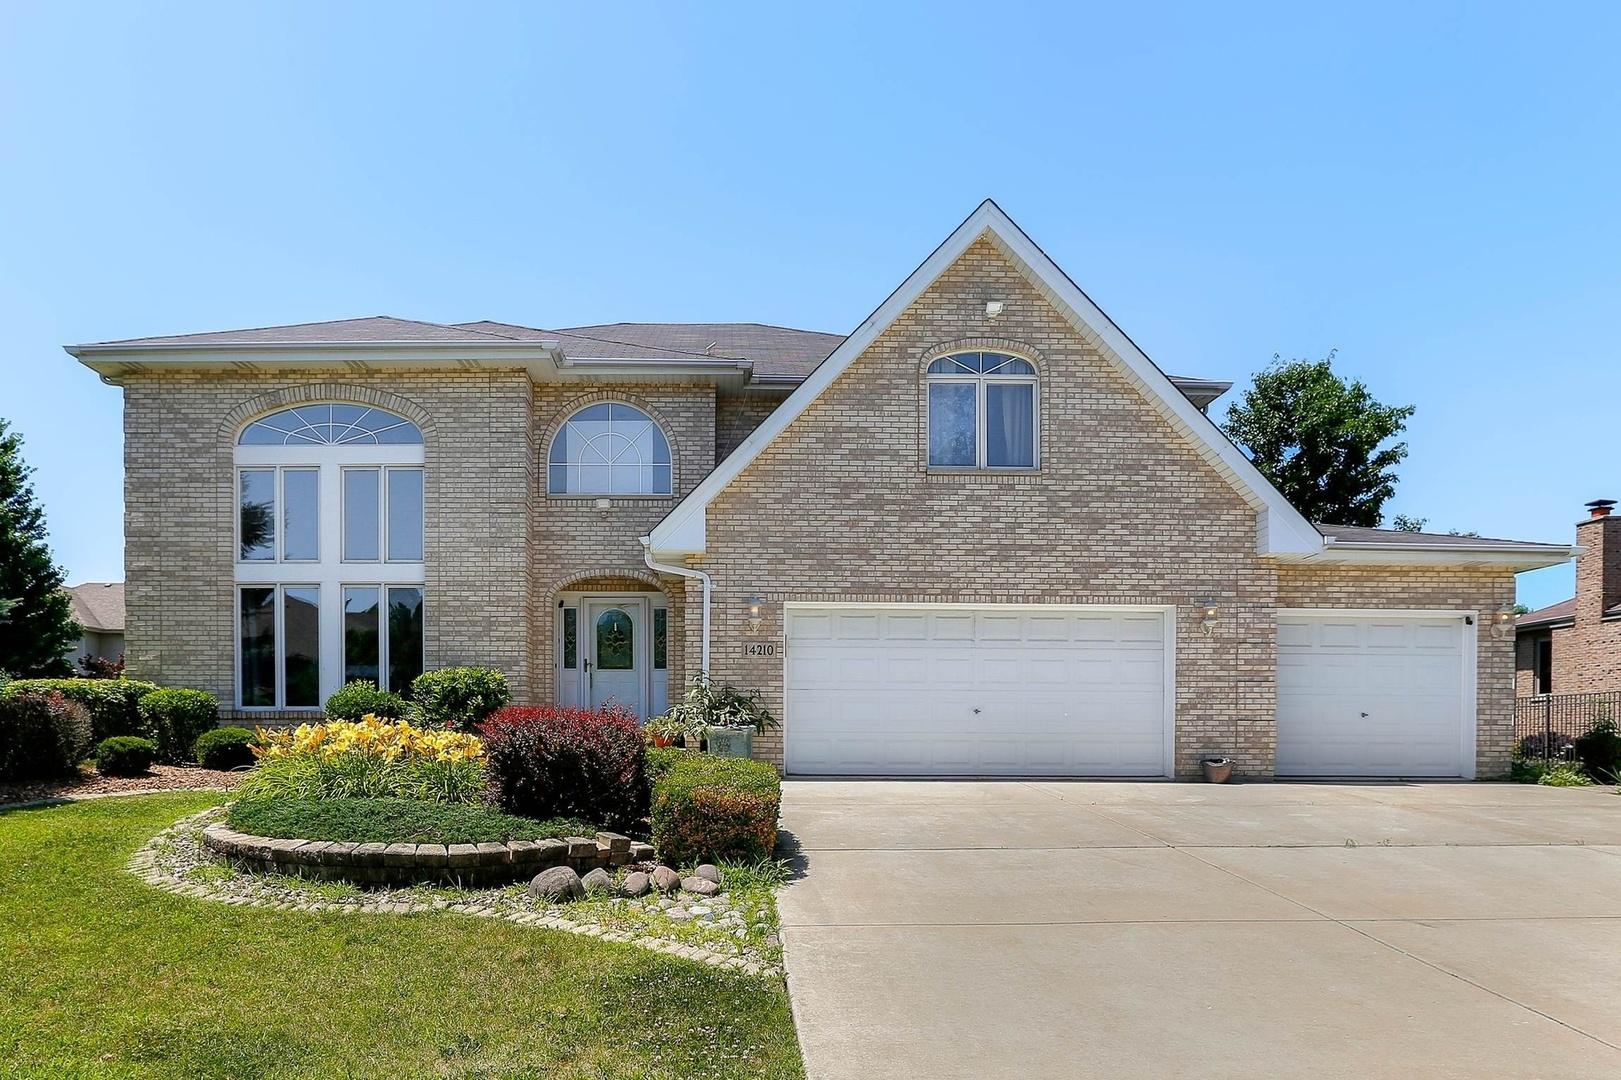 14210 Scott Lane, Orland Park, Illinois